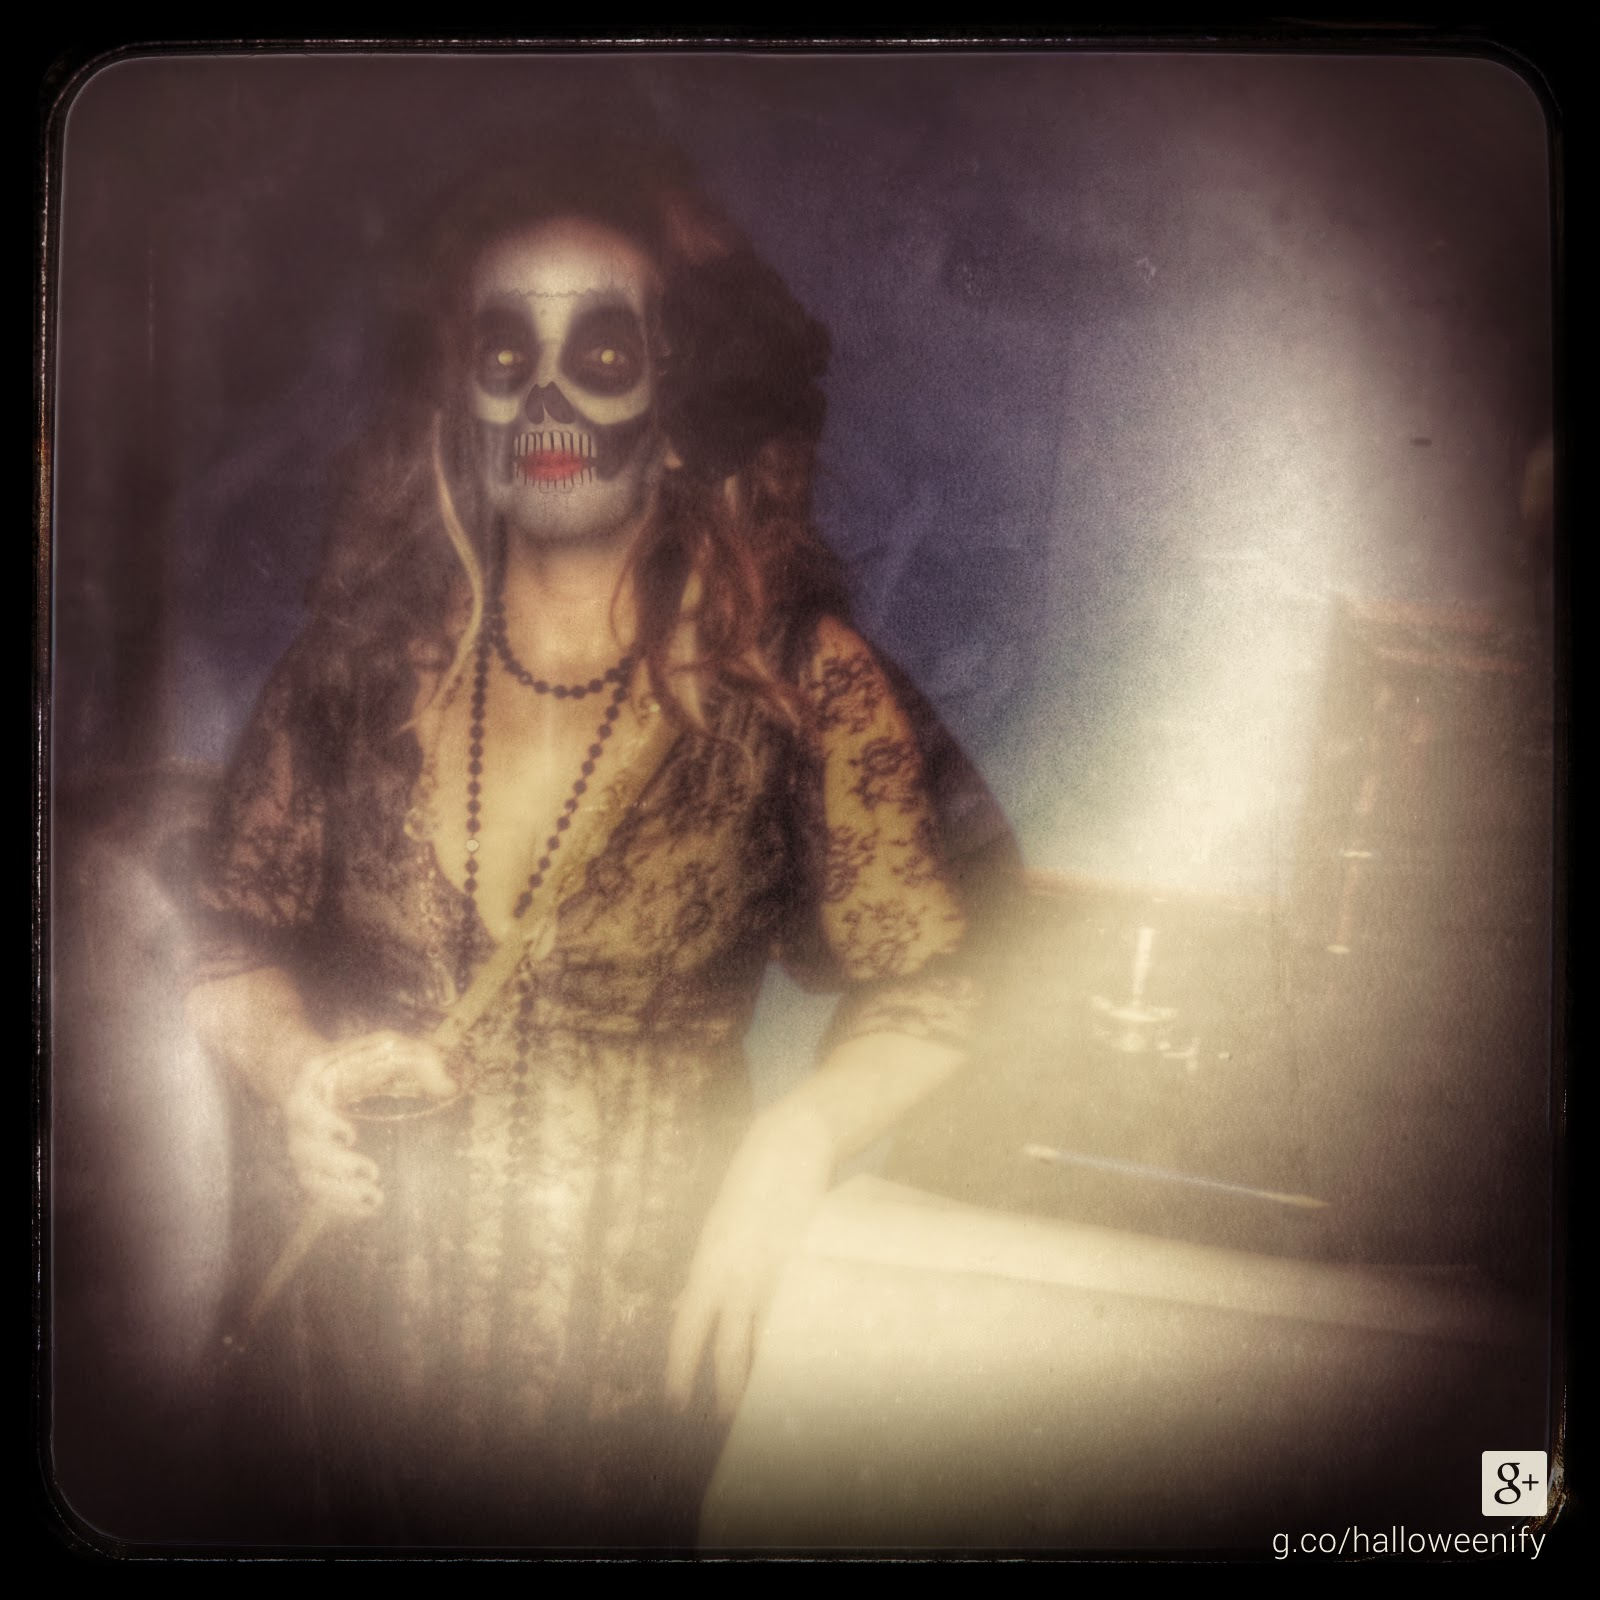 Halloweenify Traci